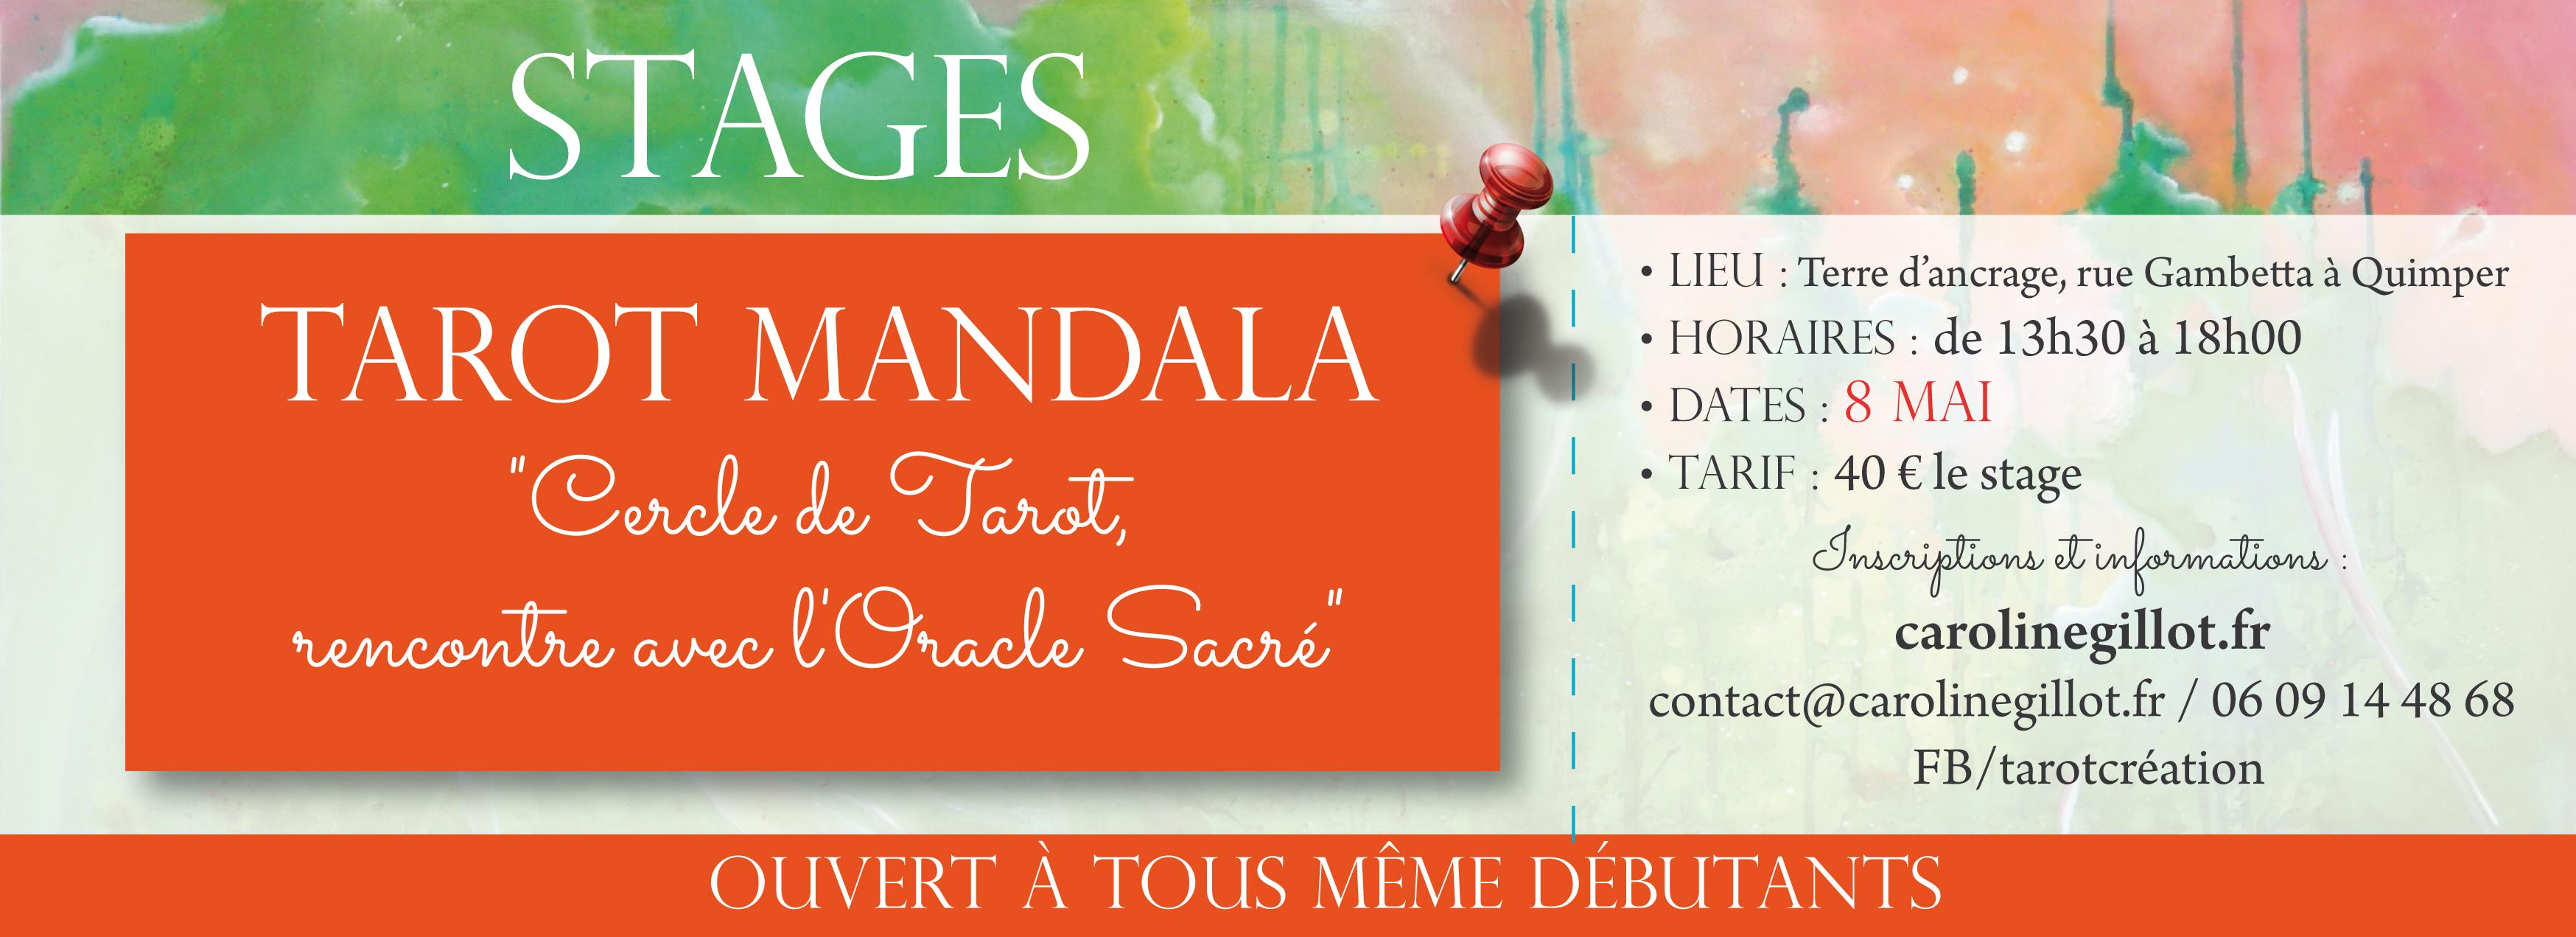 Stages Tarot Mandala